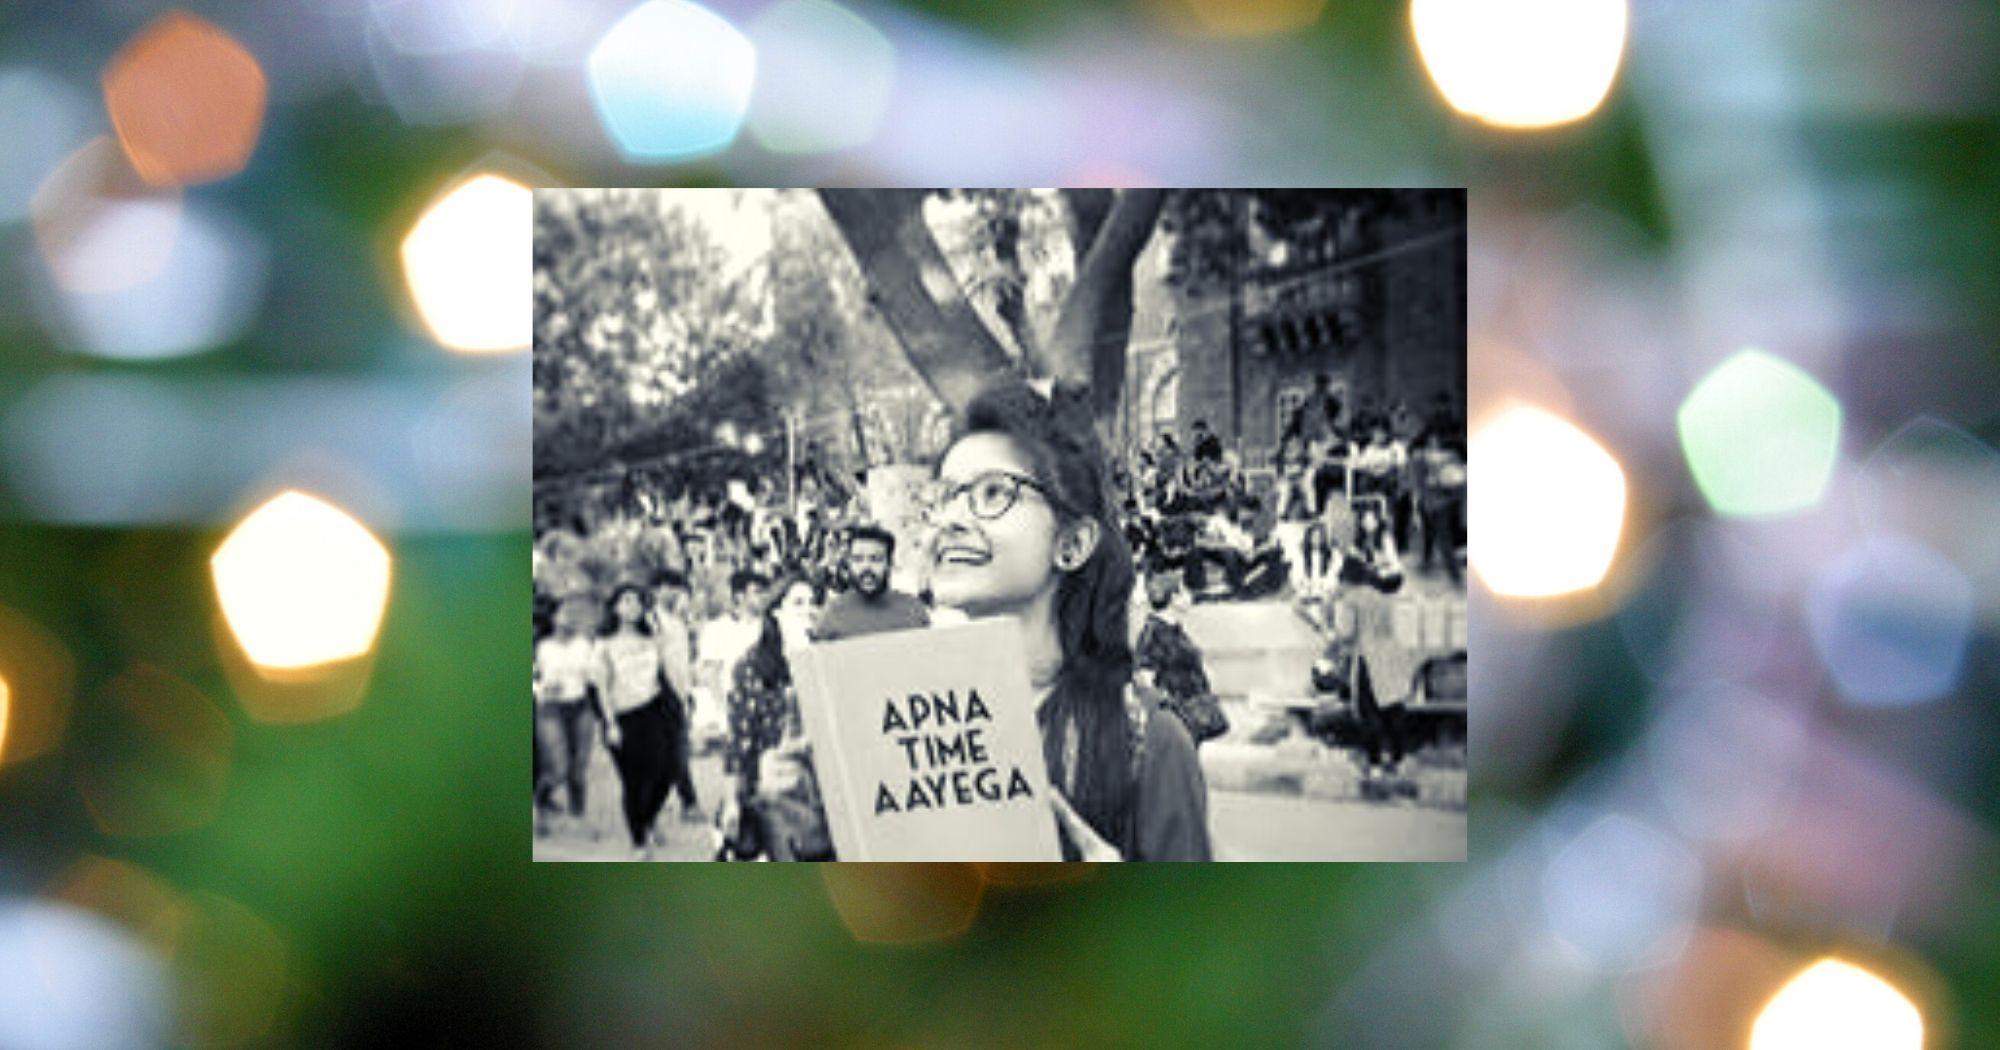 Suicidality and depression in Pakistan - Hira Raza